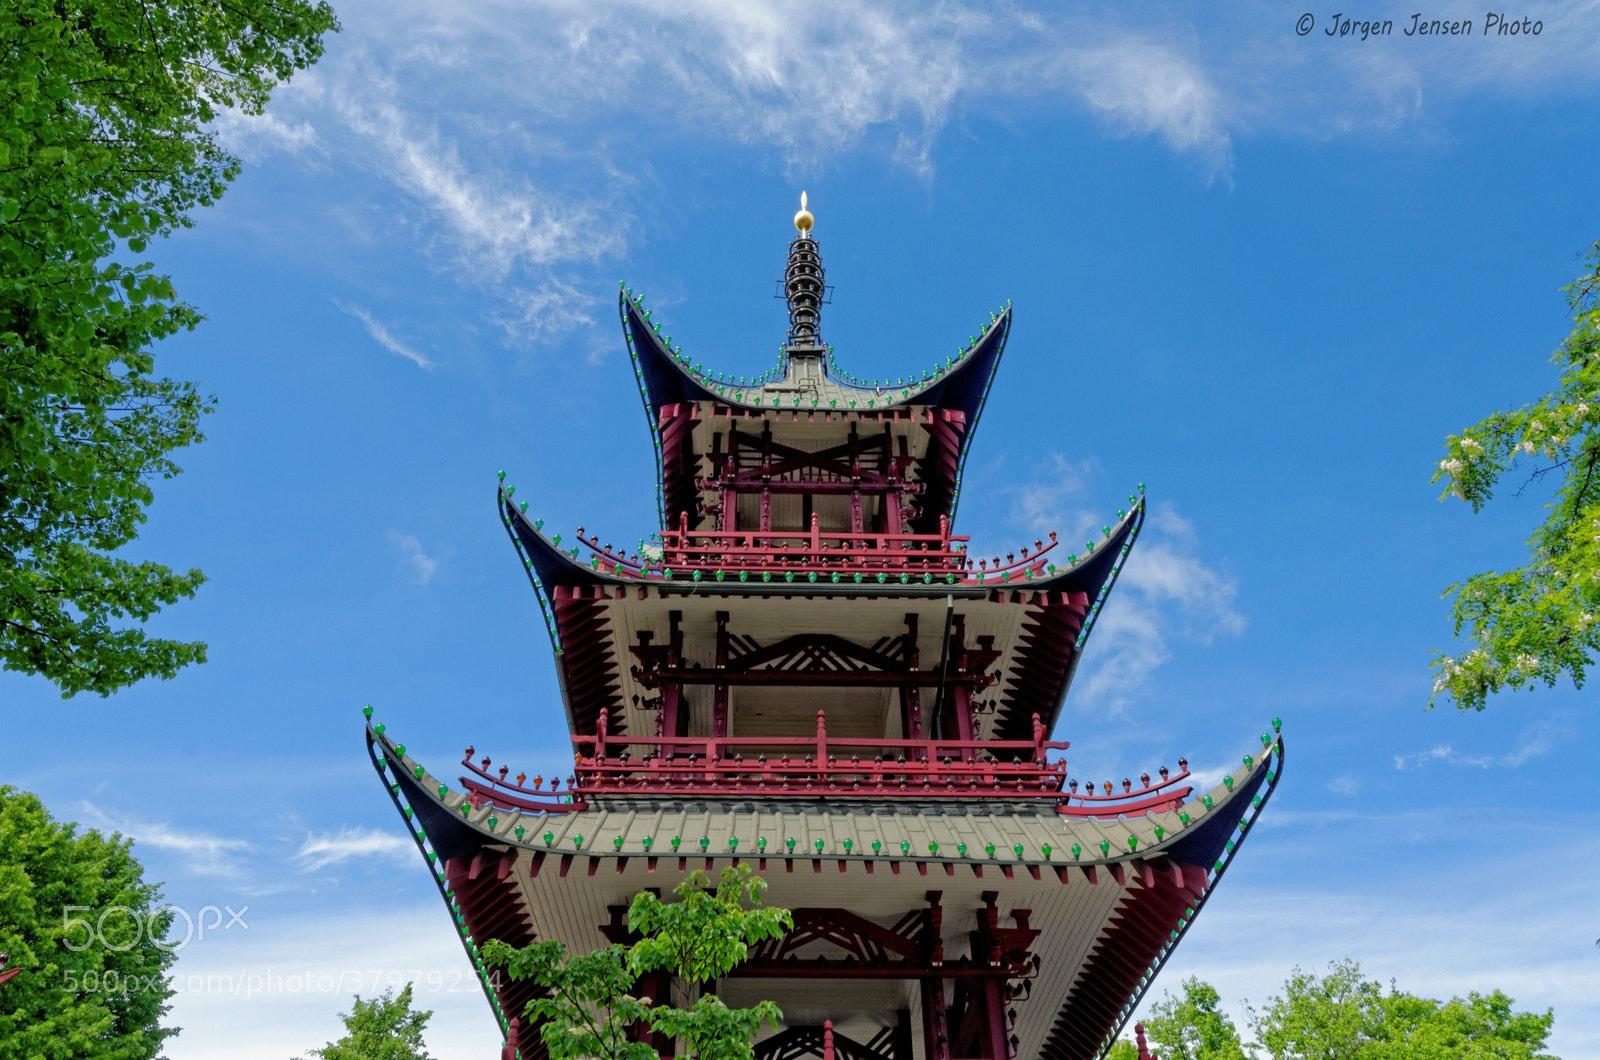 Photograph The Chinese Tower - Tivoli Copenhagen by Jørgen Jensen on 500px